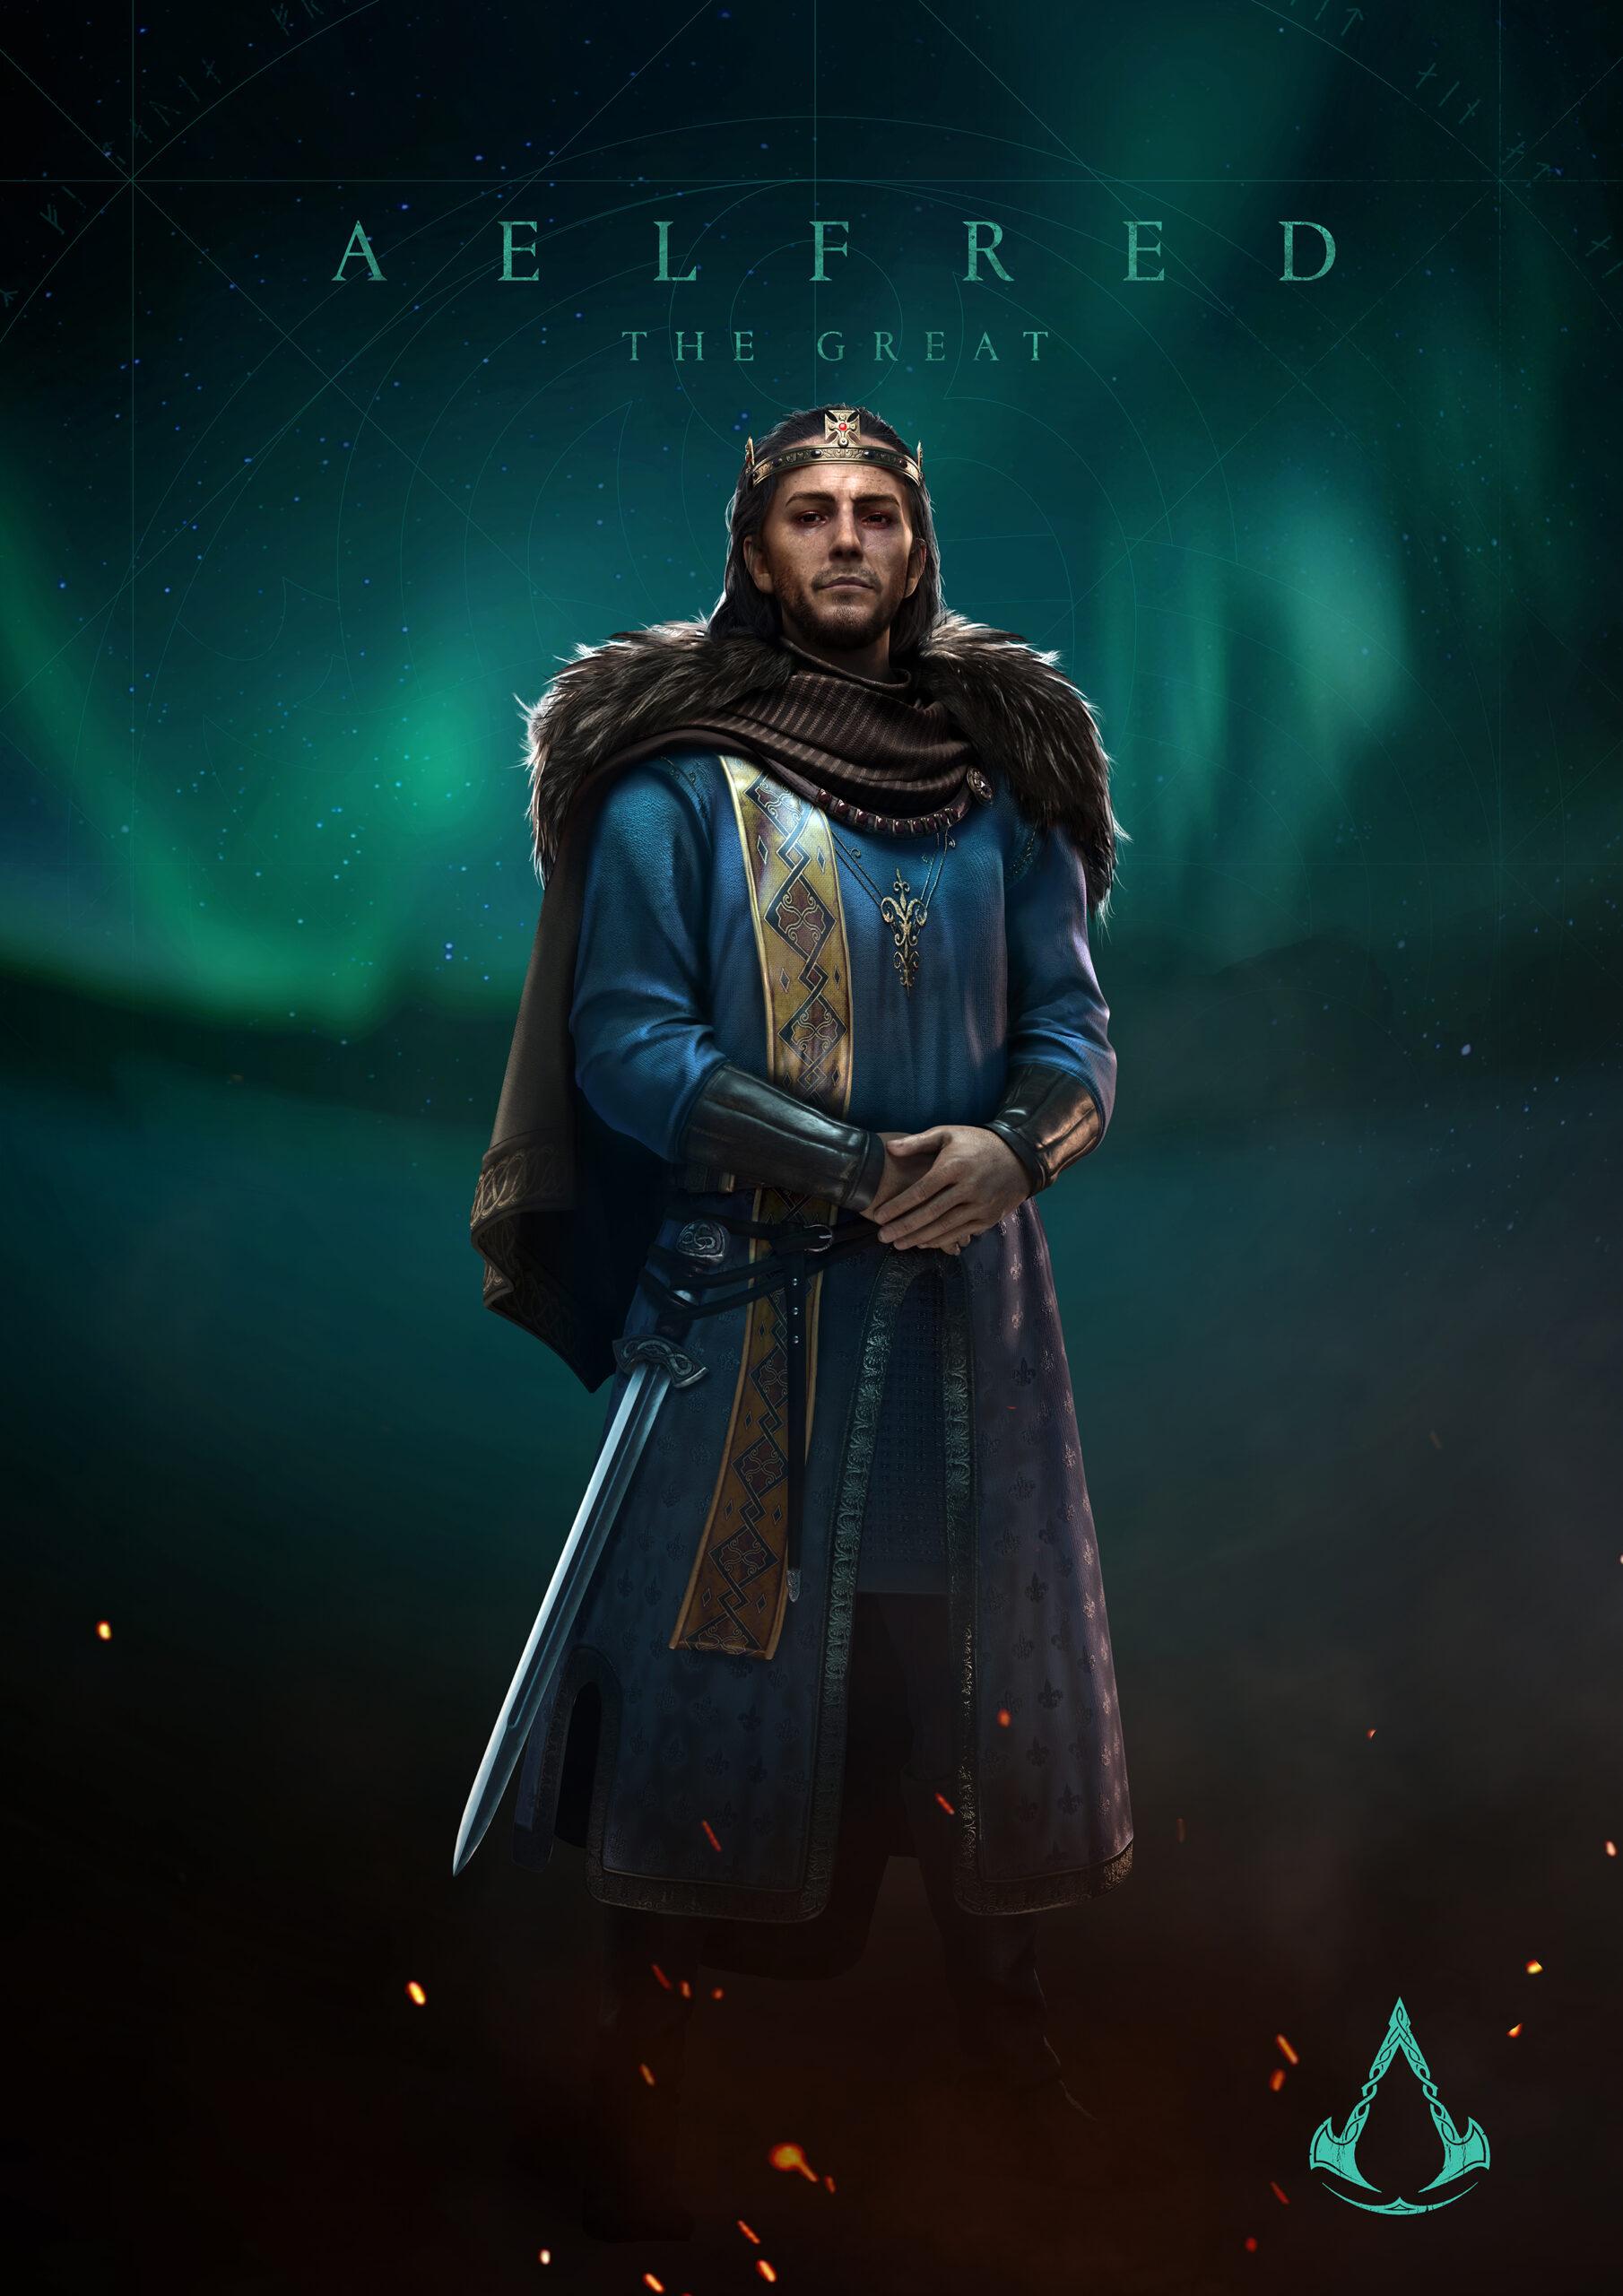 Assassins Creed Valhalla Character Render 3